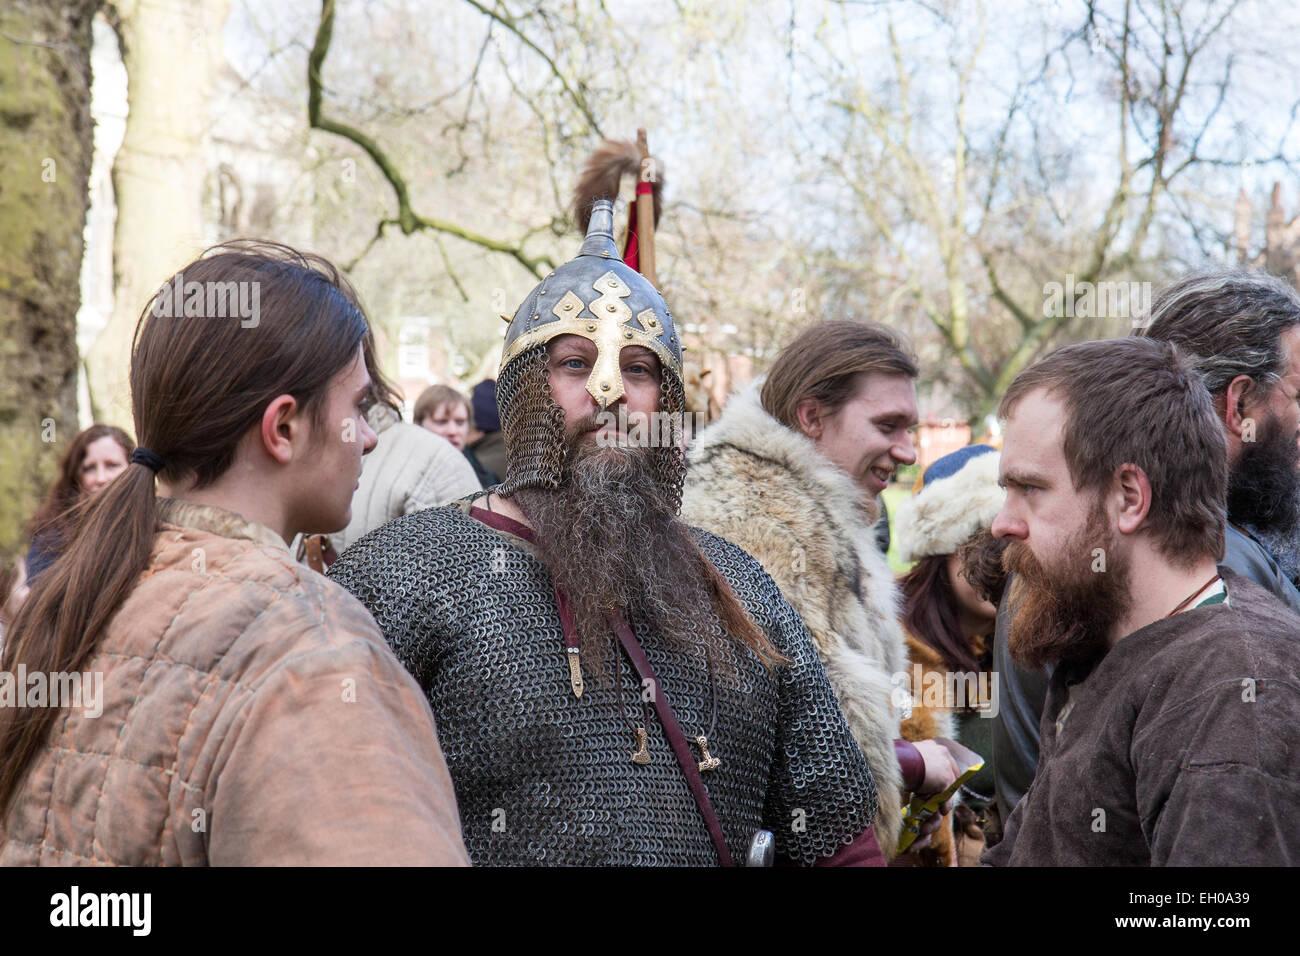 People taking part in the Jorvik Viking Festival, York 2015 - Stock Image